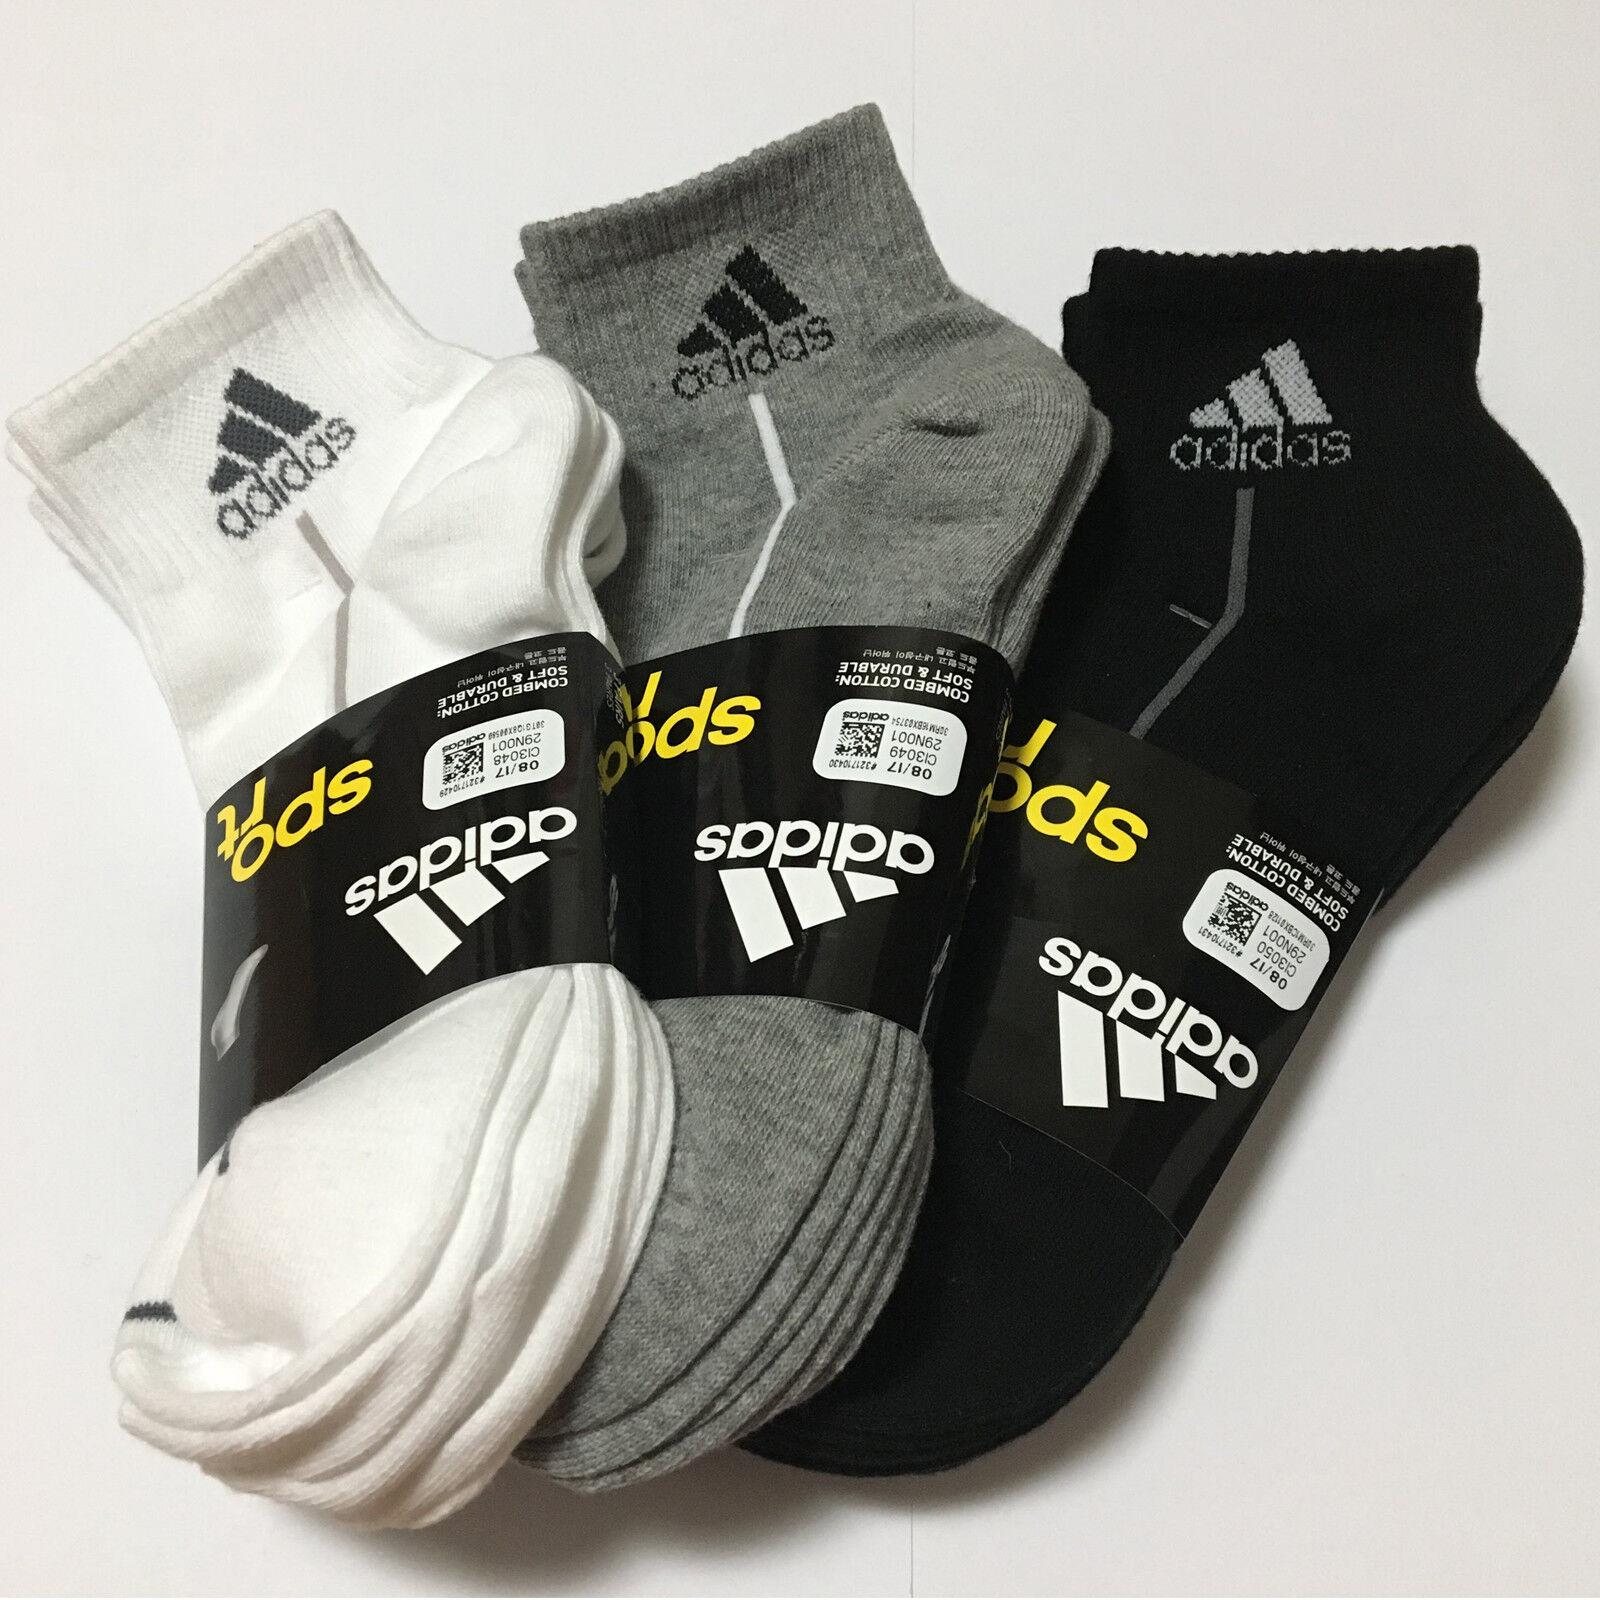 ADIDAS KOREA Men's Sport Casual Socks 3Pairs White Gray Bl